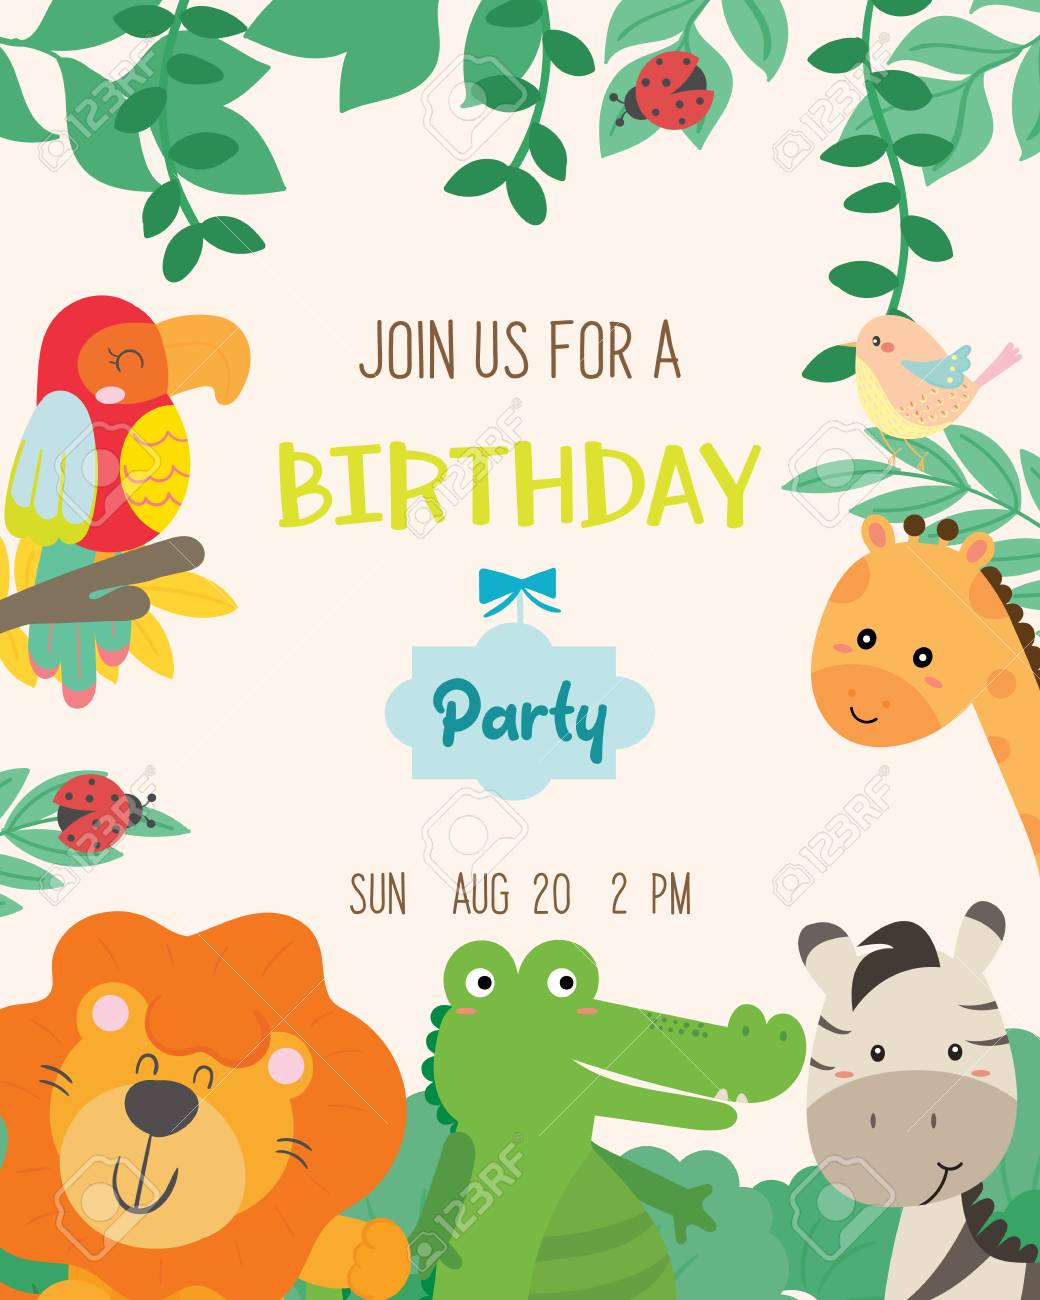 Cute animal theme birthday party invitation card vector illustration. - 107667196